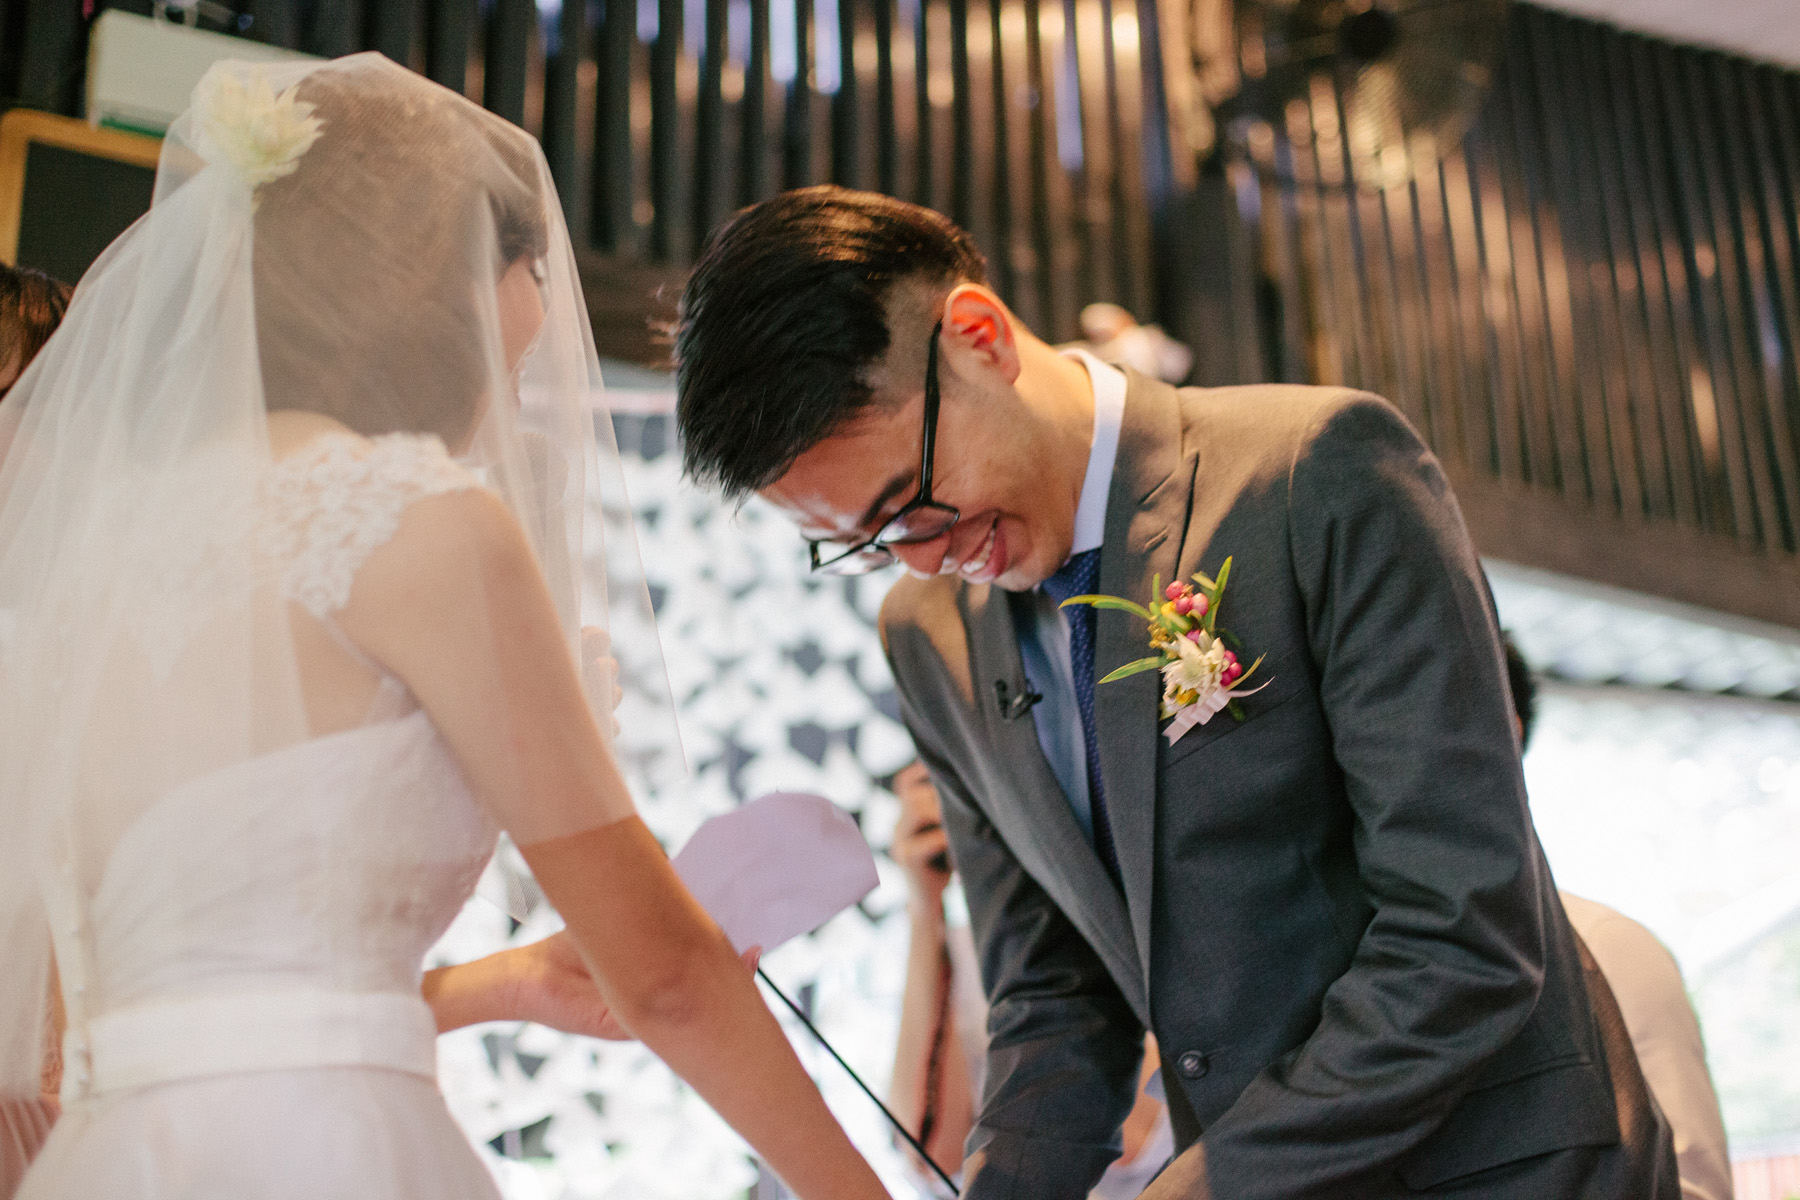 singapore-wedding-travel-photographer-faith-alvin-wedding-wmt-41.jpg